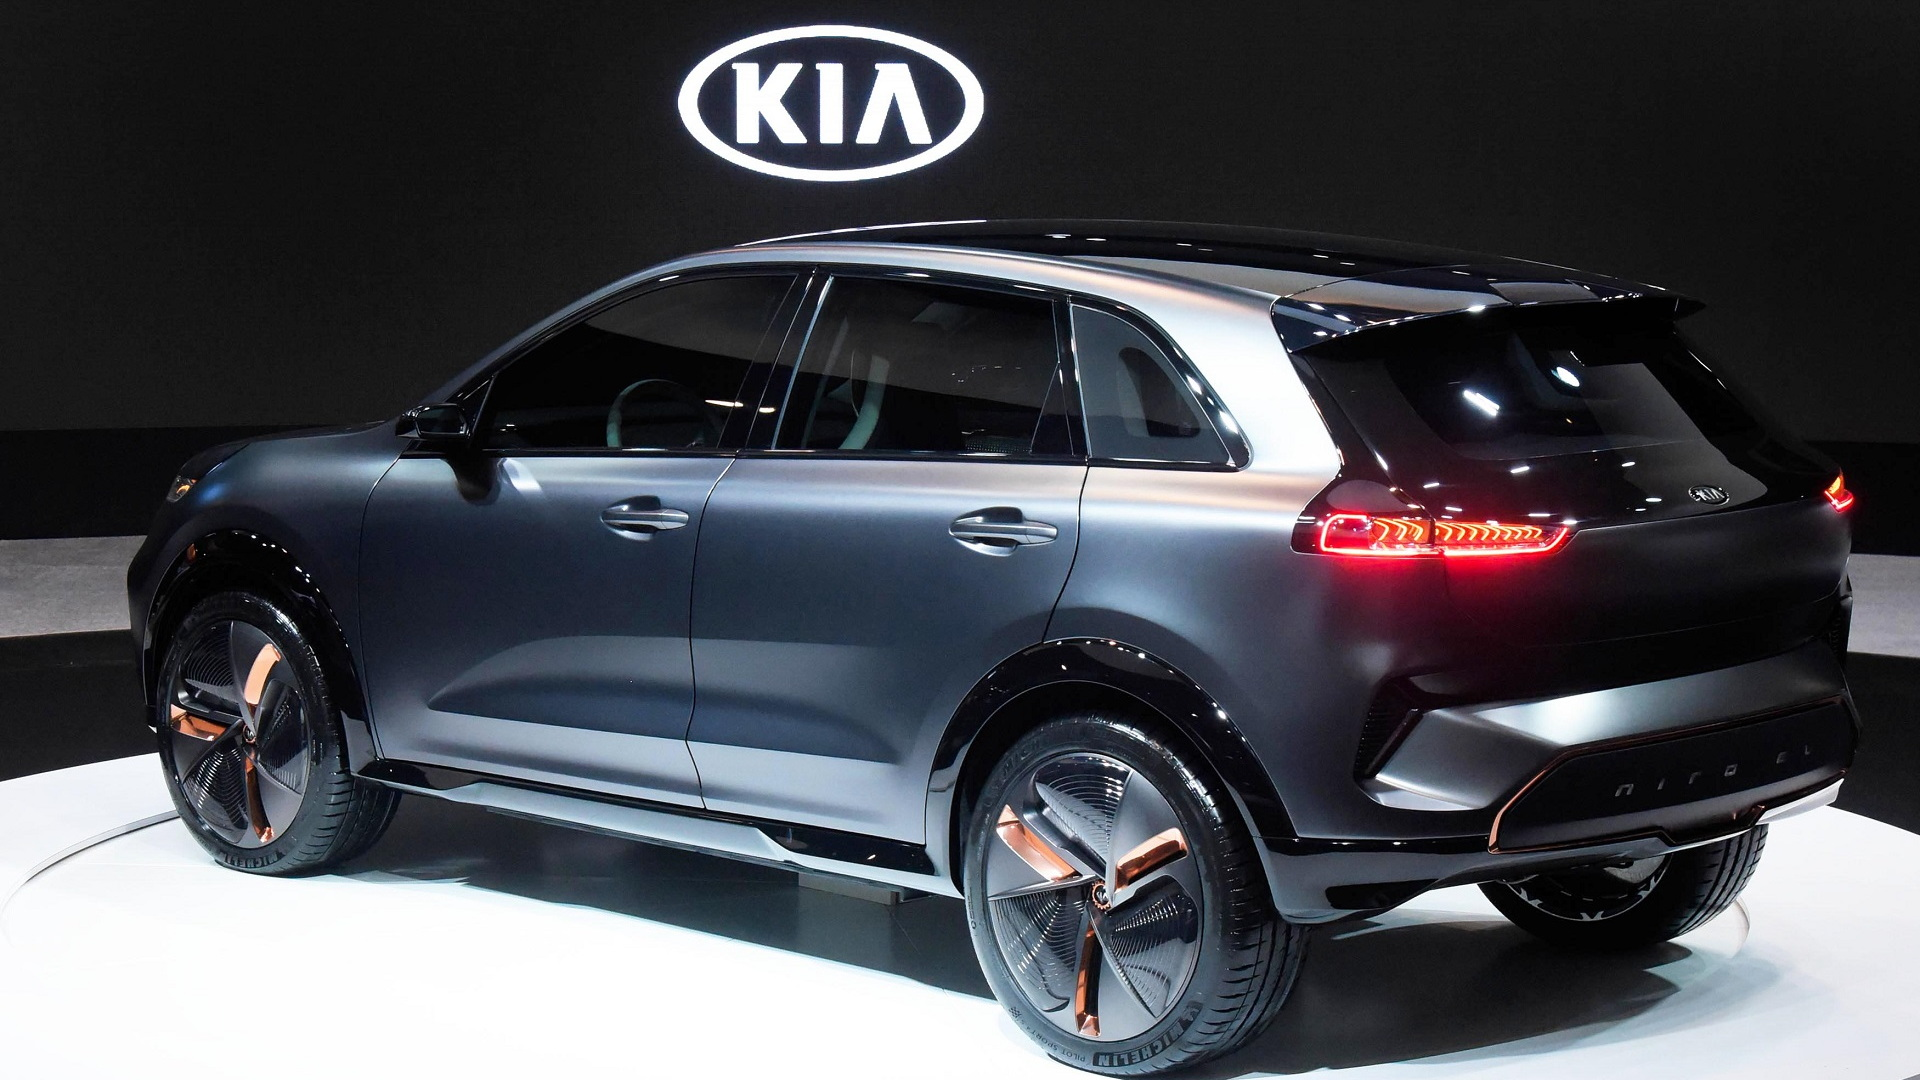 Kia Niro EV concept shown at 2018 Consumer Electronics Show, Las Vegas